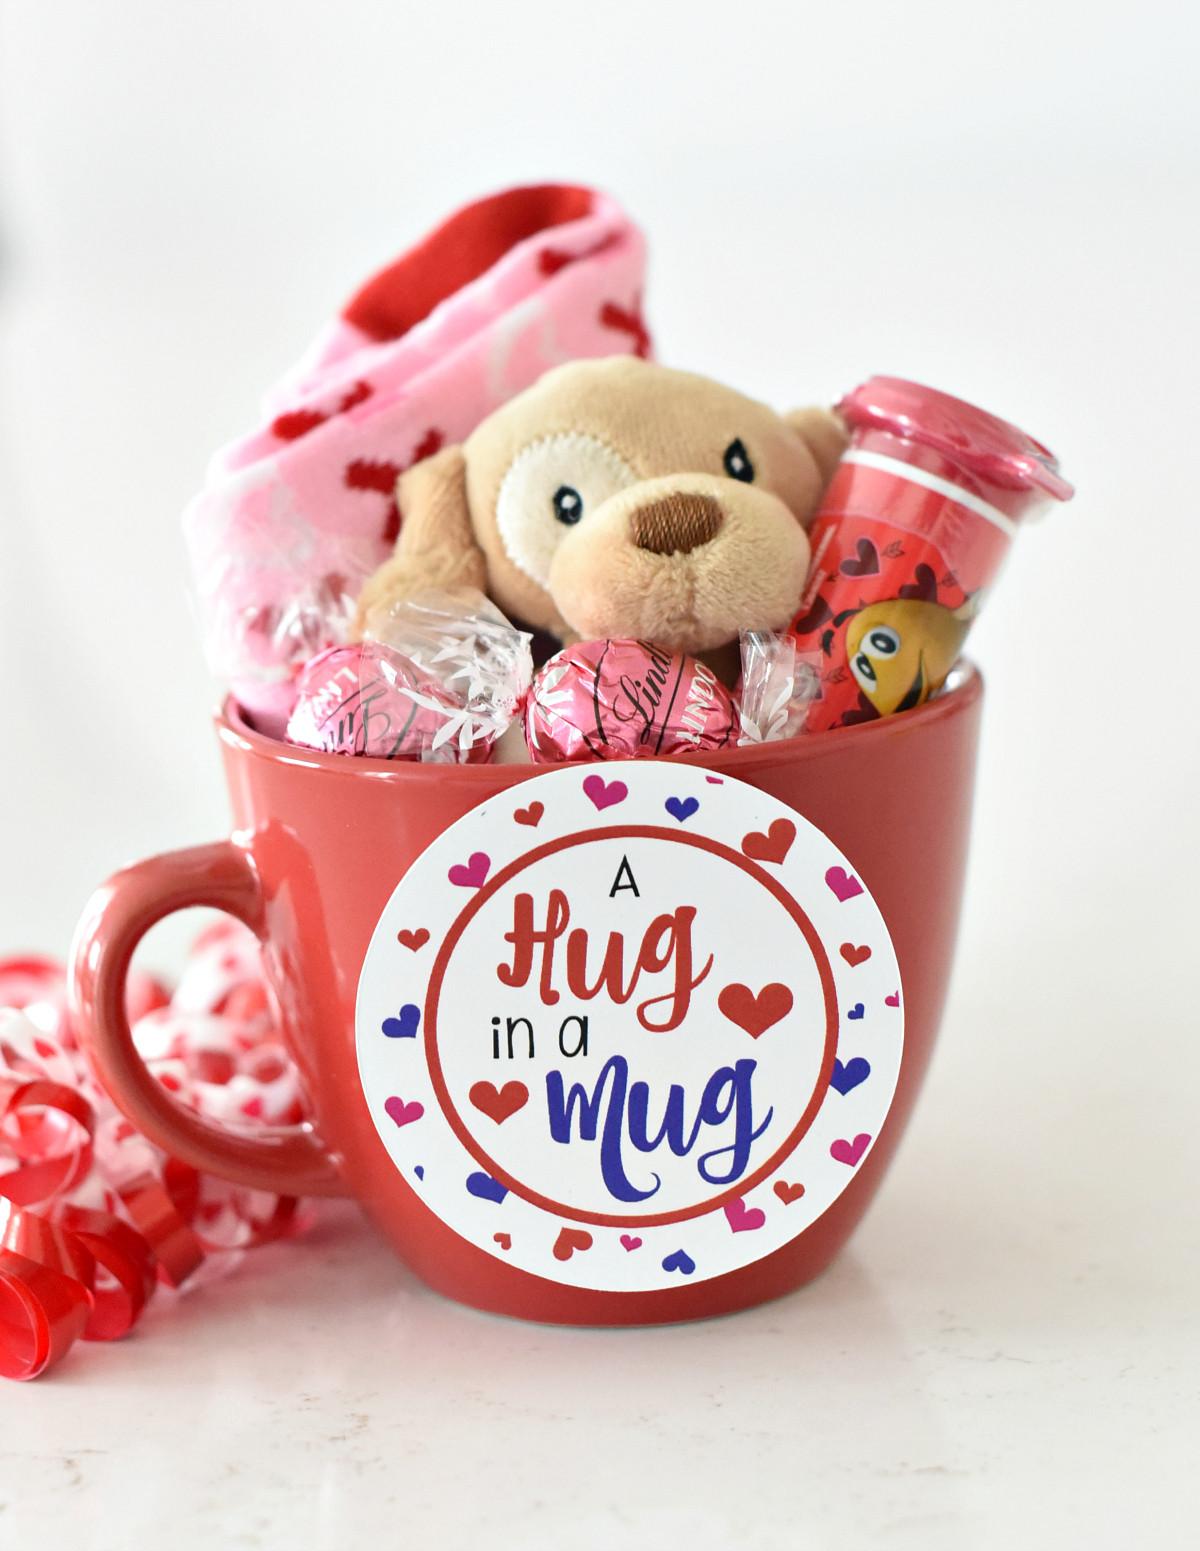 Valentines Candy Gift Ideas  Valentine Chocolate Bouquet – Fun Squared